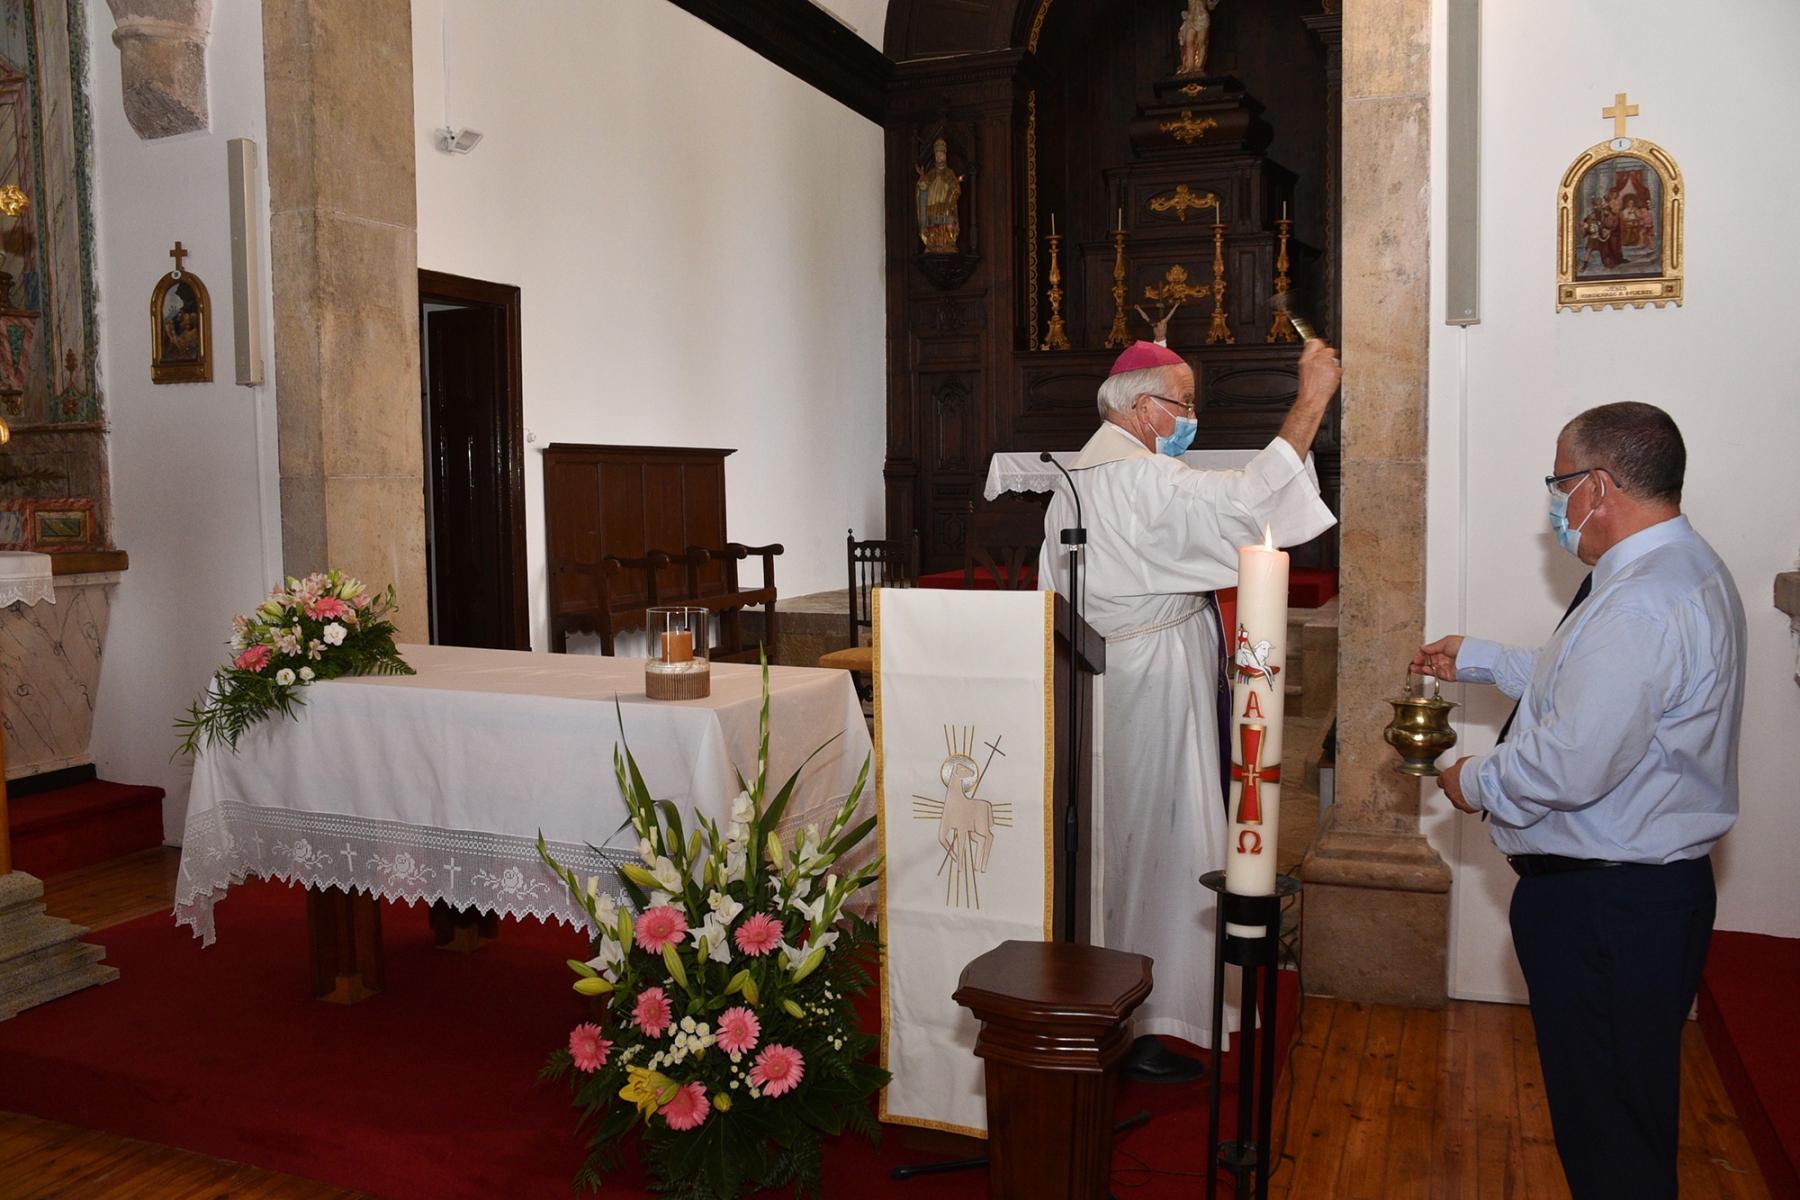 Inauguracao_bencao_obras_restauro_igreja_alcoutim-32